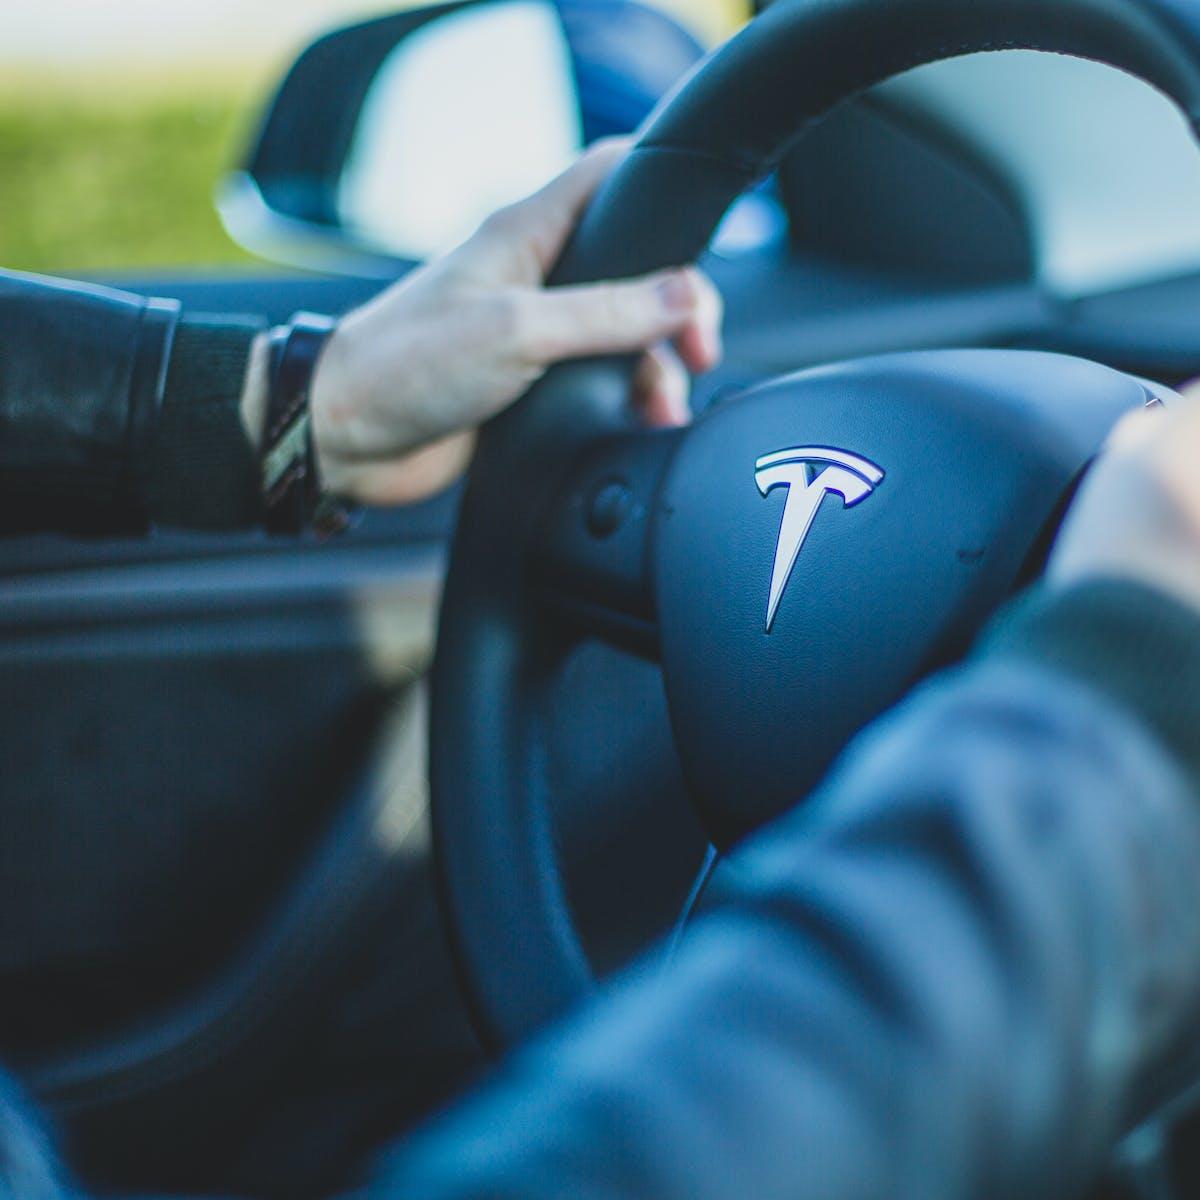 Tesla Pickup Truck: Elon Musk's next car could feature a surprising design